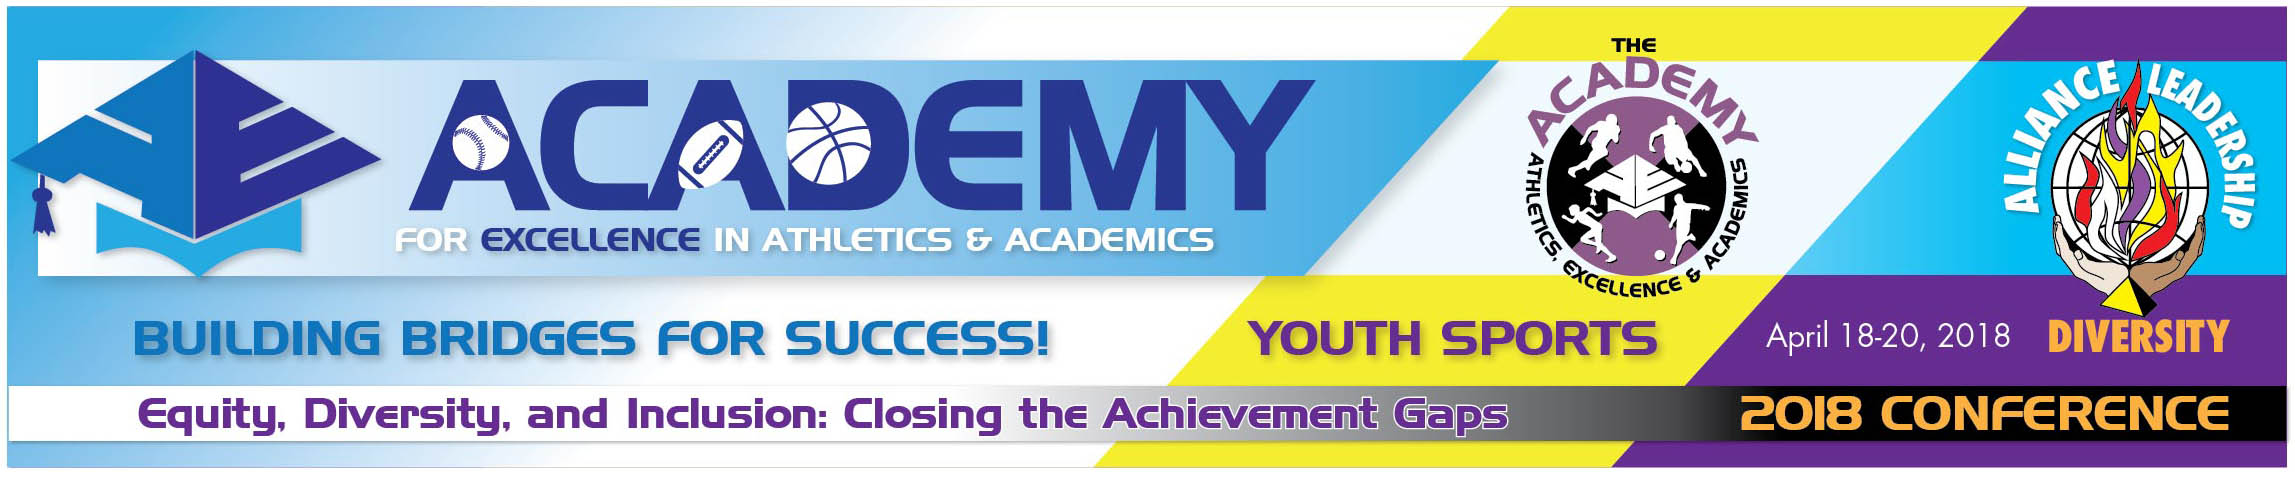 Academy Web Use Horiz Banner